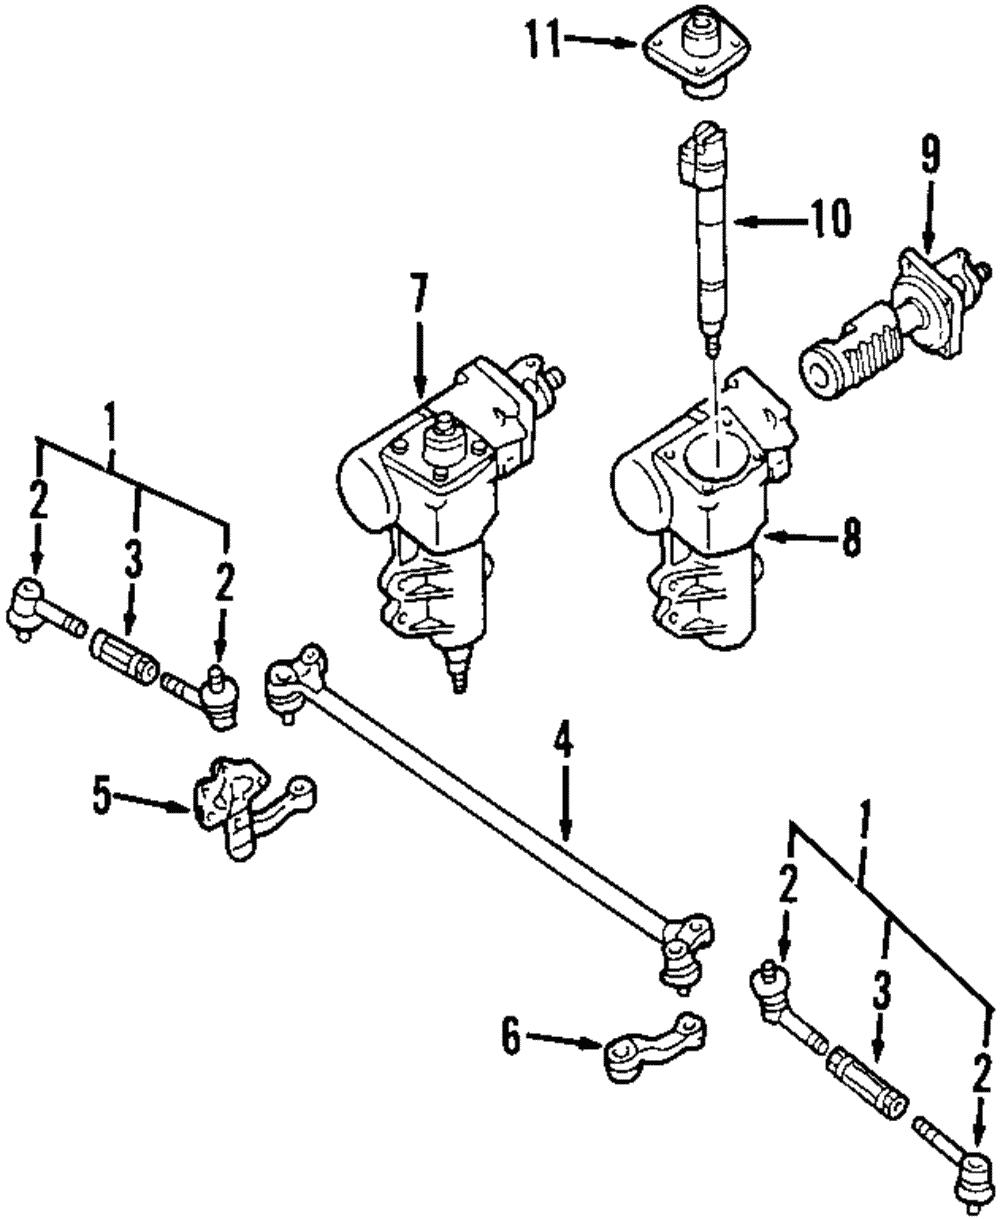 medium resolution of details about genuine nissan center link d8560 vk90a